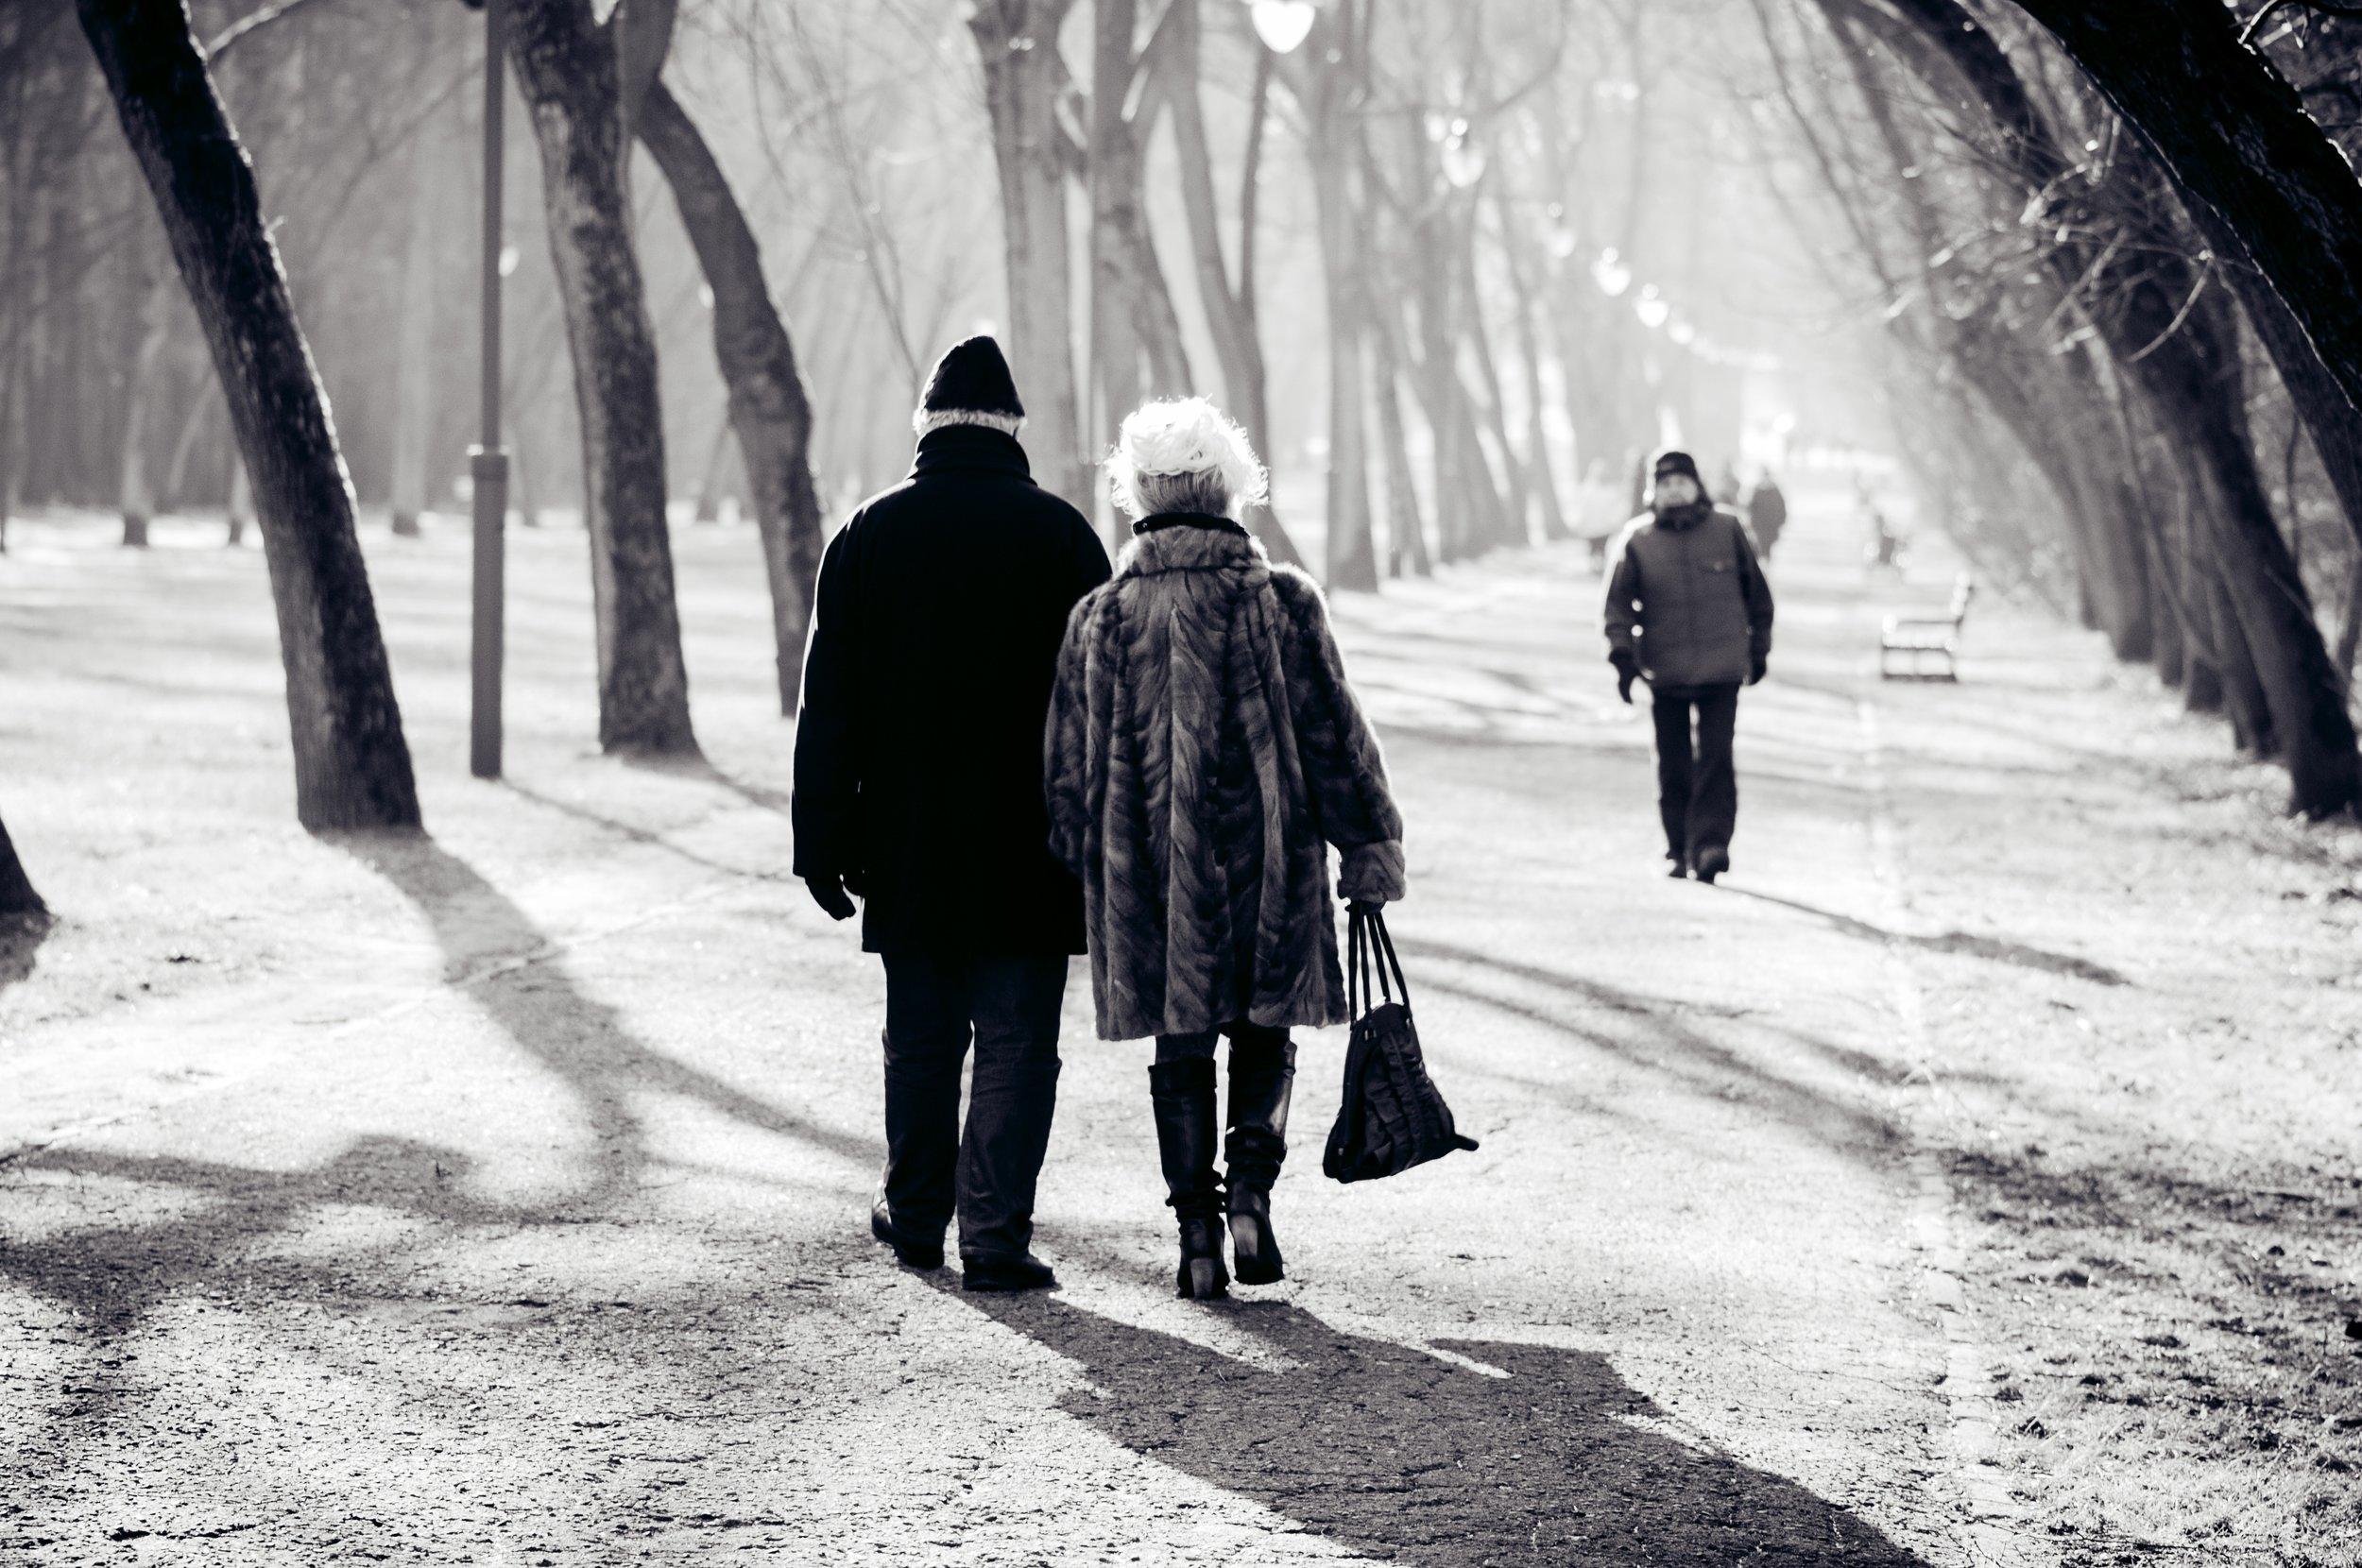 man-nature-walking-snow-winter-black-and-white-853220-pxhere.com.jpg